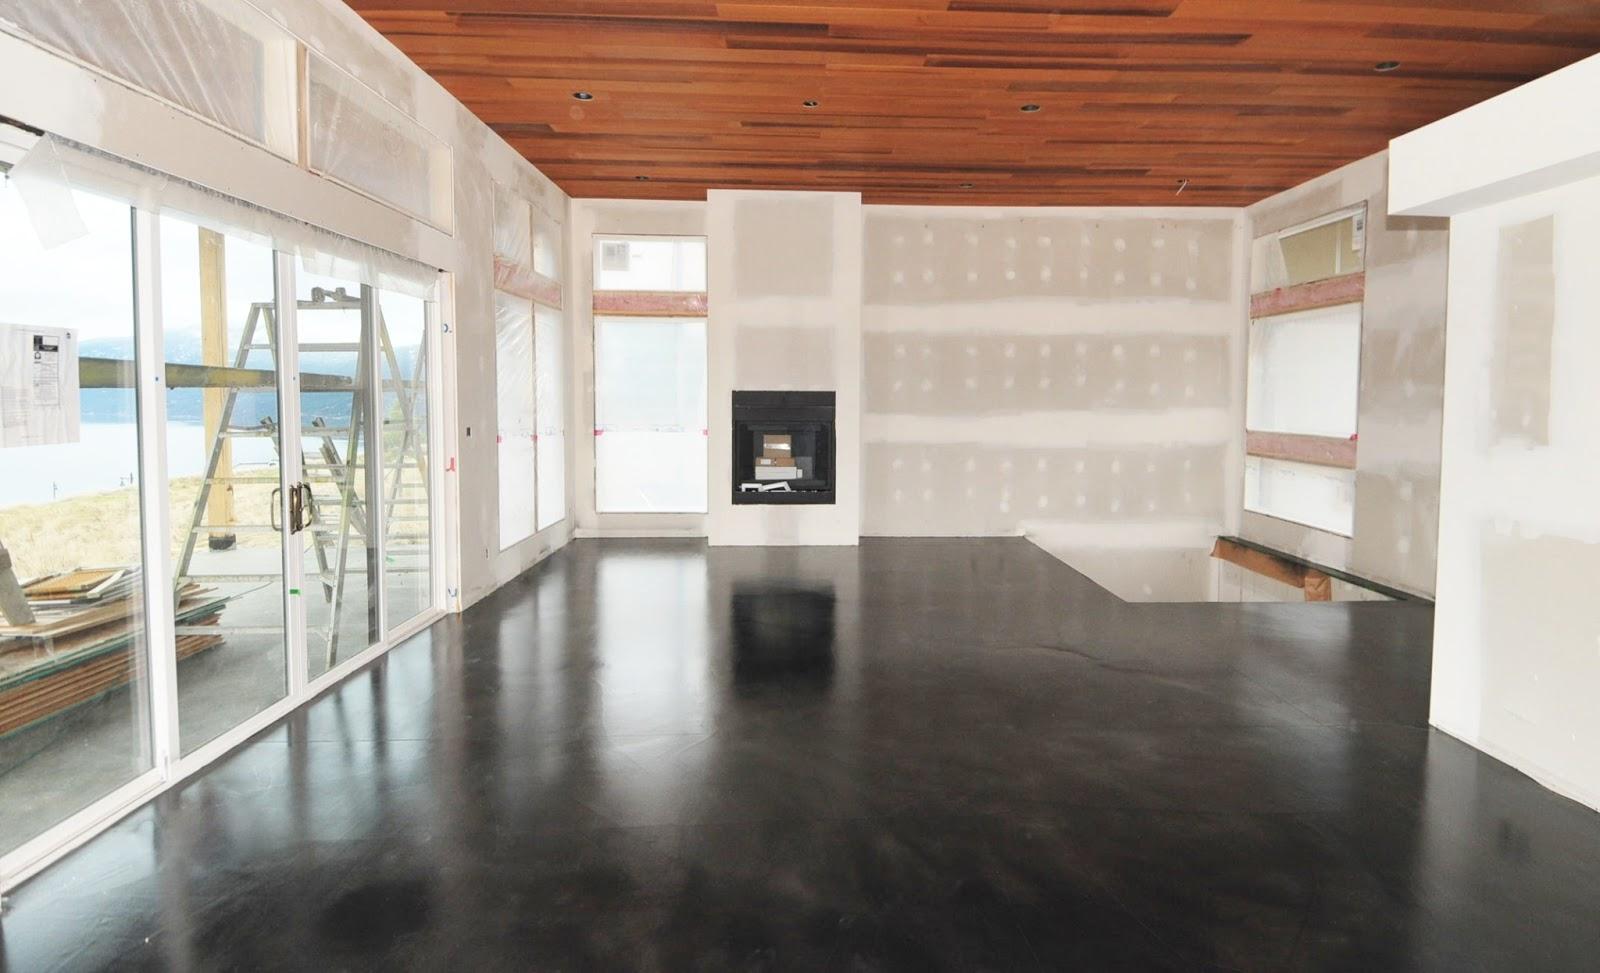 MODE CONCRETE: Black Acid Stained Modern Concrete Floor ...